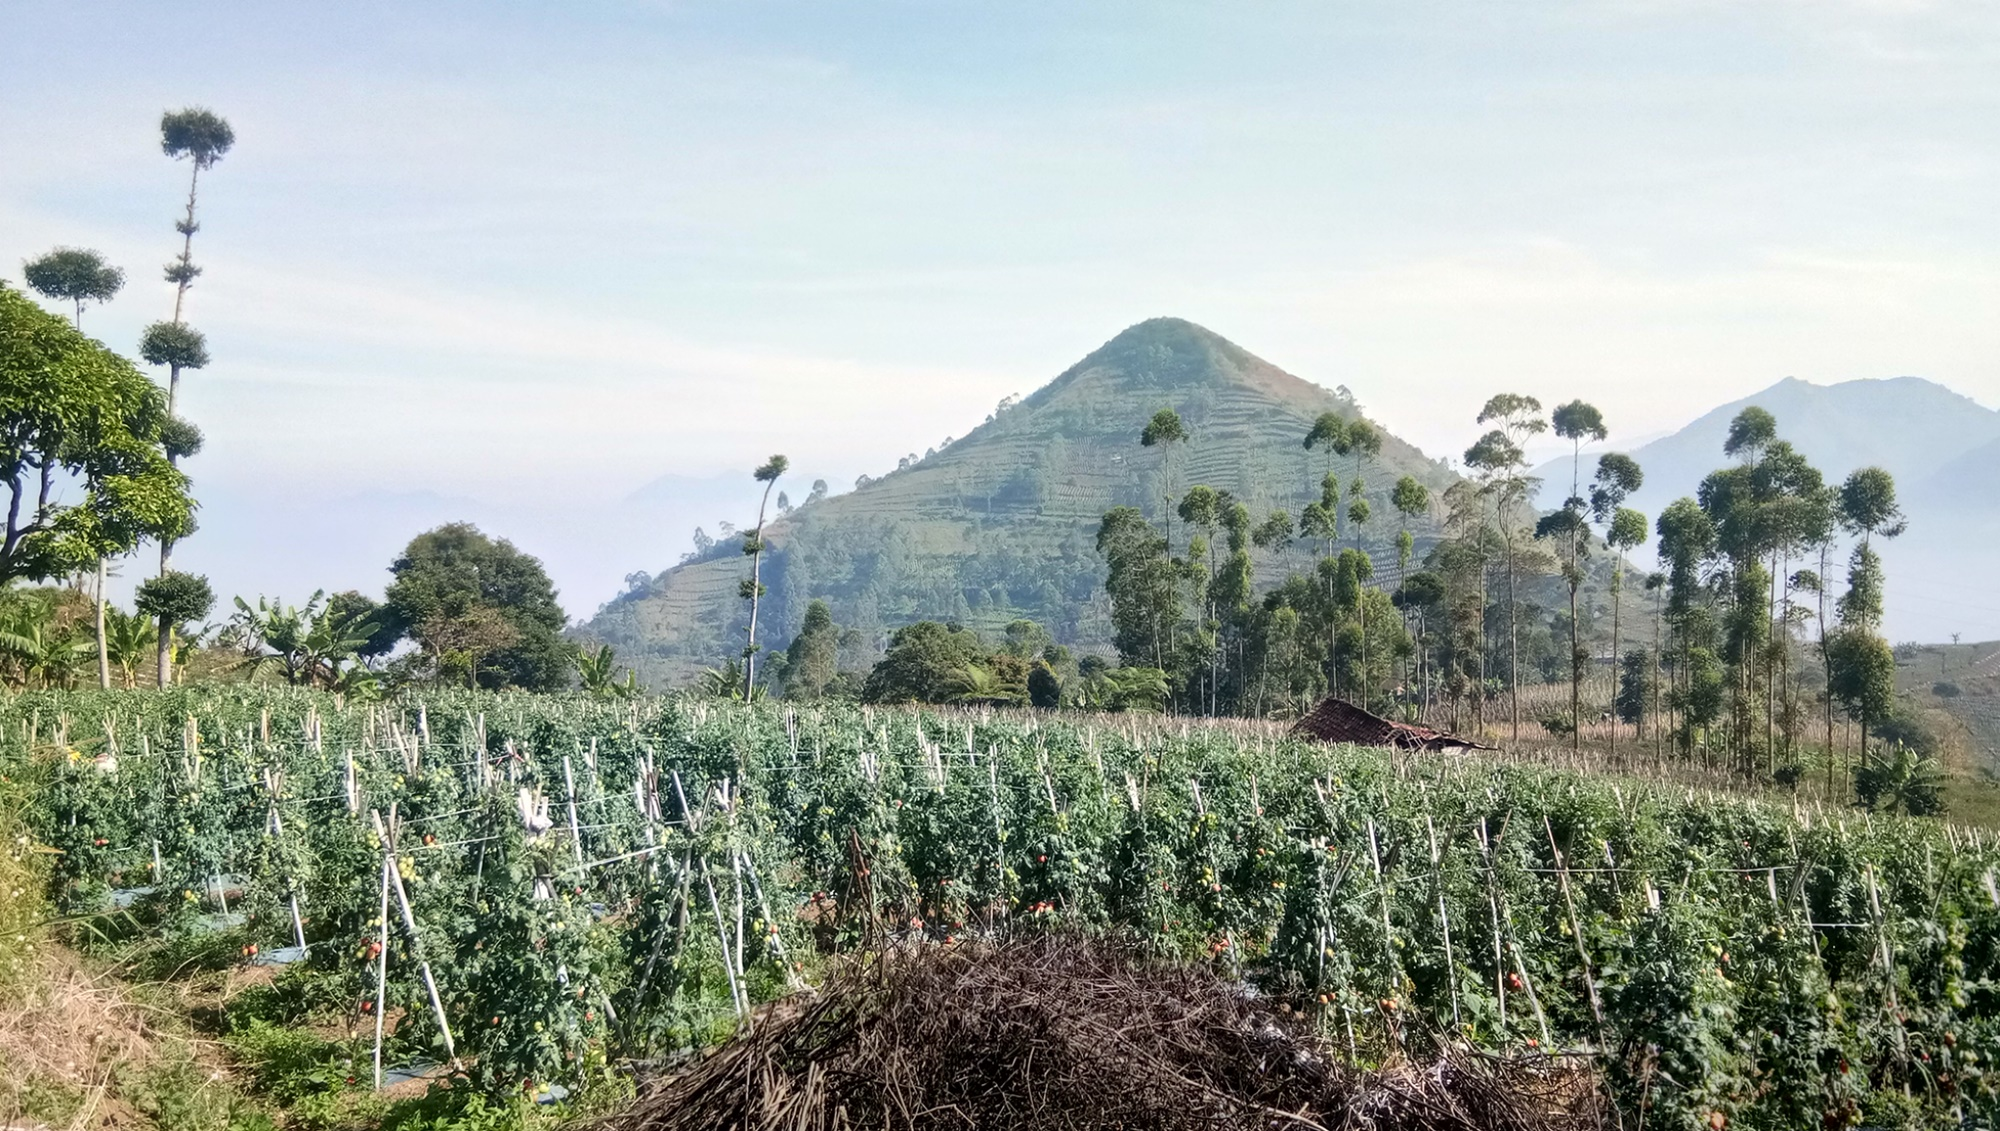 Gunung berbentuk kerucut sempurna